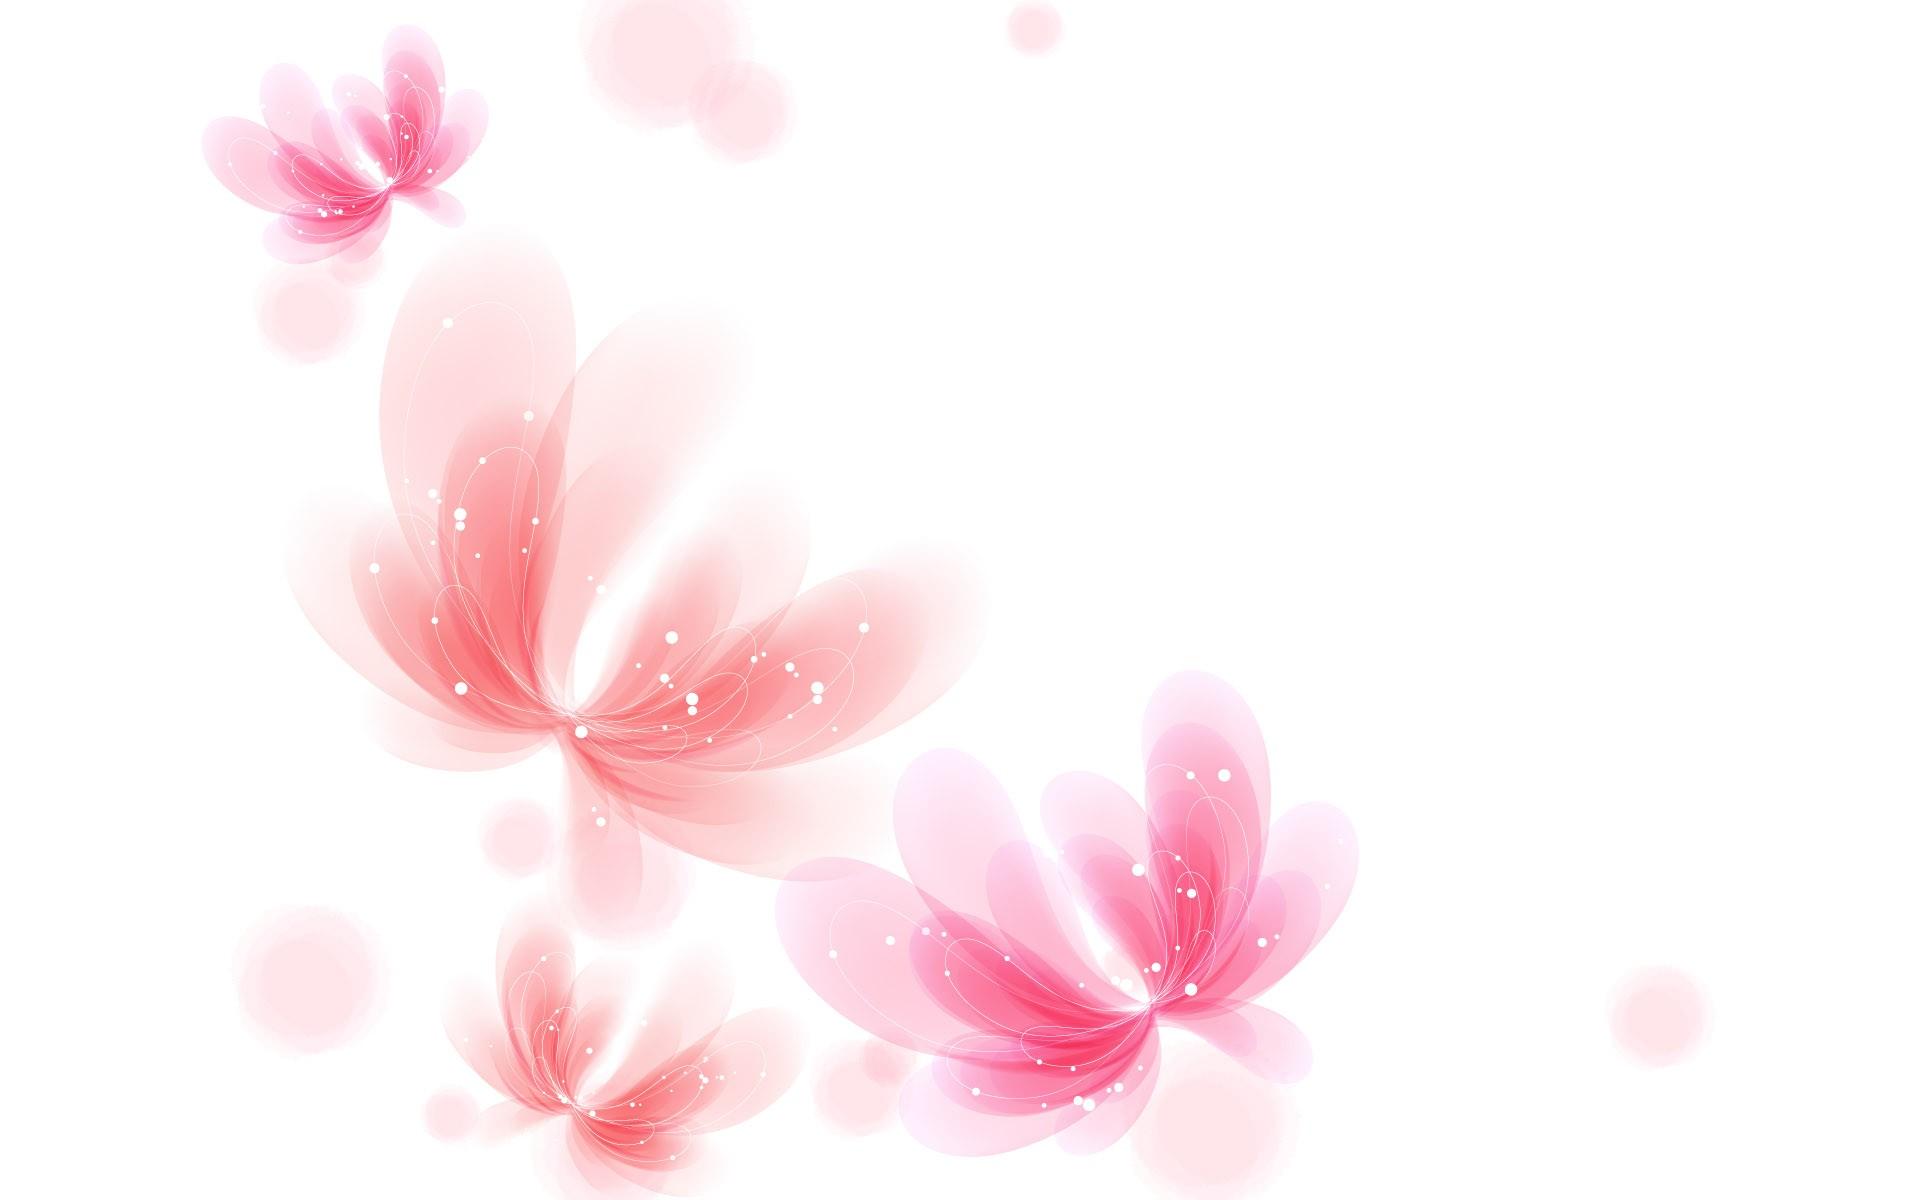 Pink White Wallpaper 1920x1200 Pink White Background 1920x1200